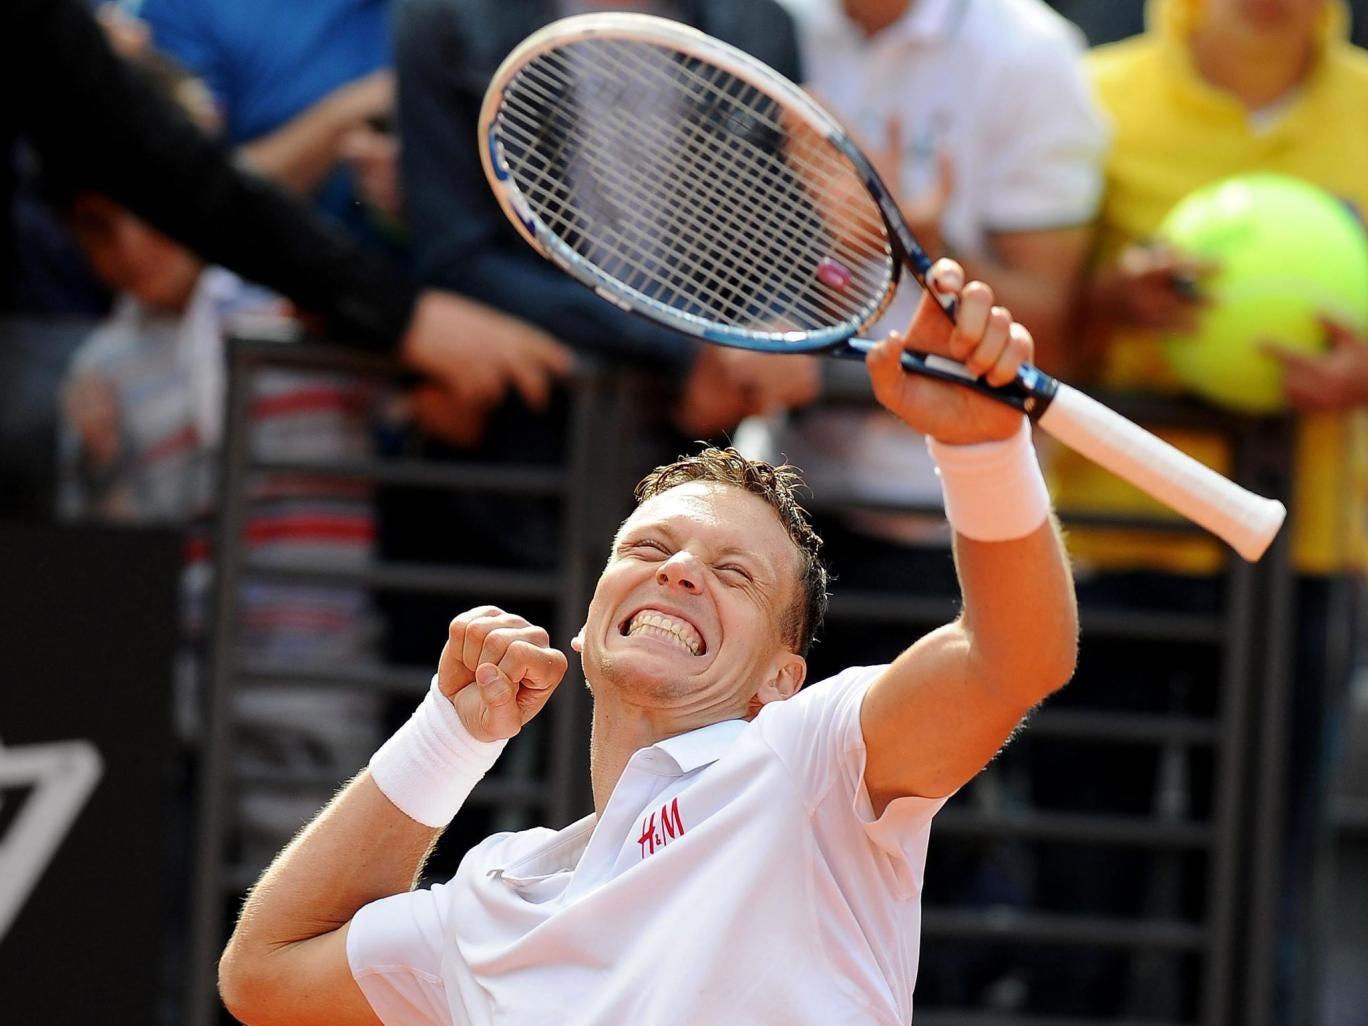 Thomas Berdych celebrates after beating Novak Djokovic